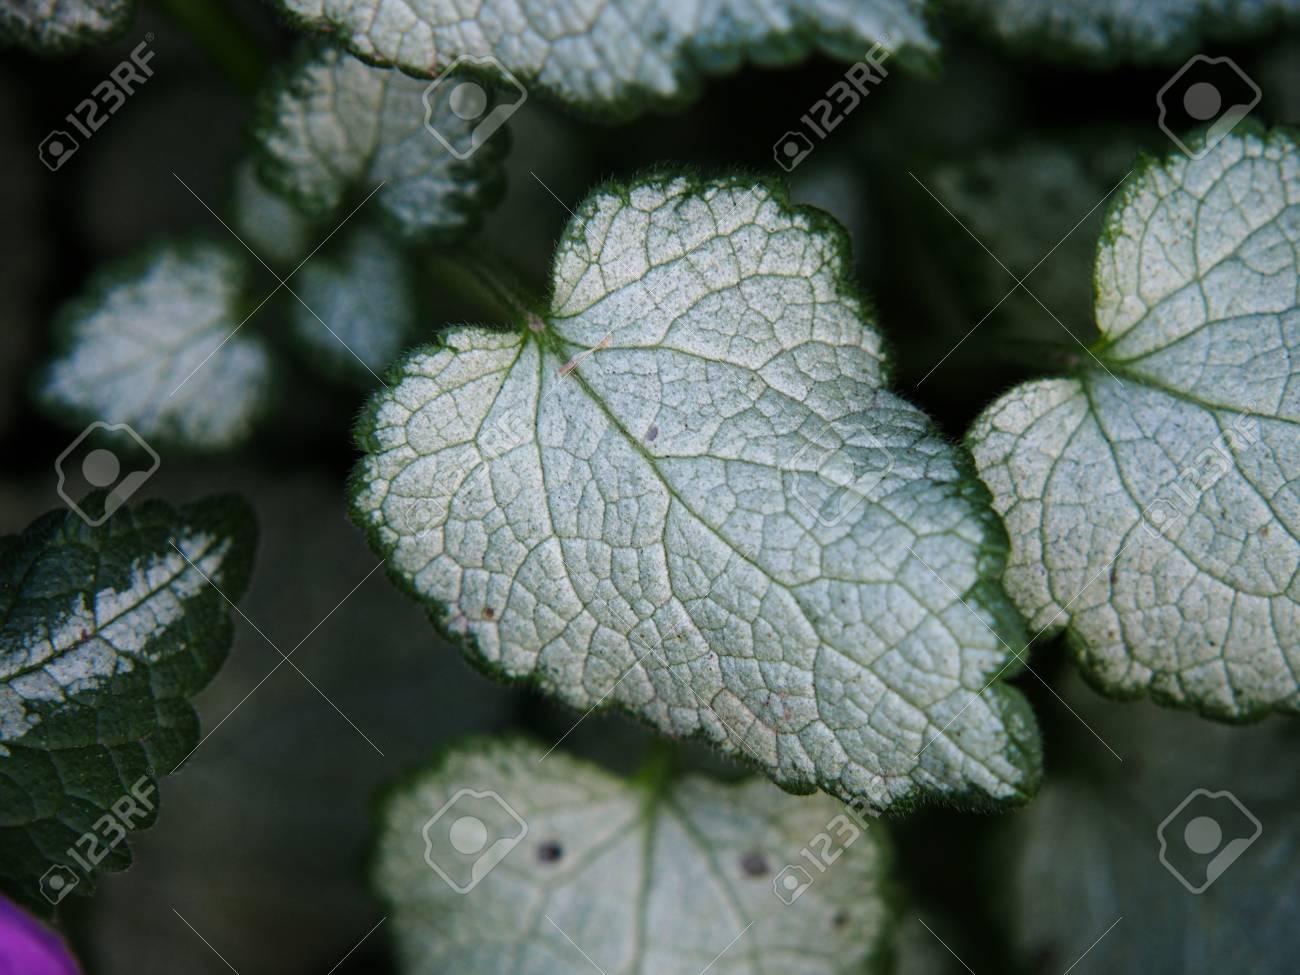 Lamium Maculatum White Nancy Henbit Spotted Spotted Dead Nettle